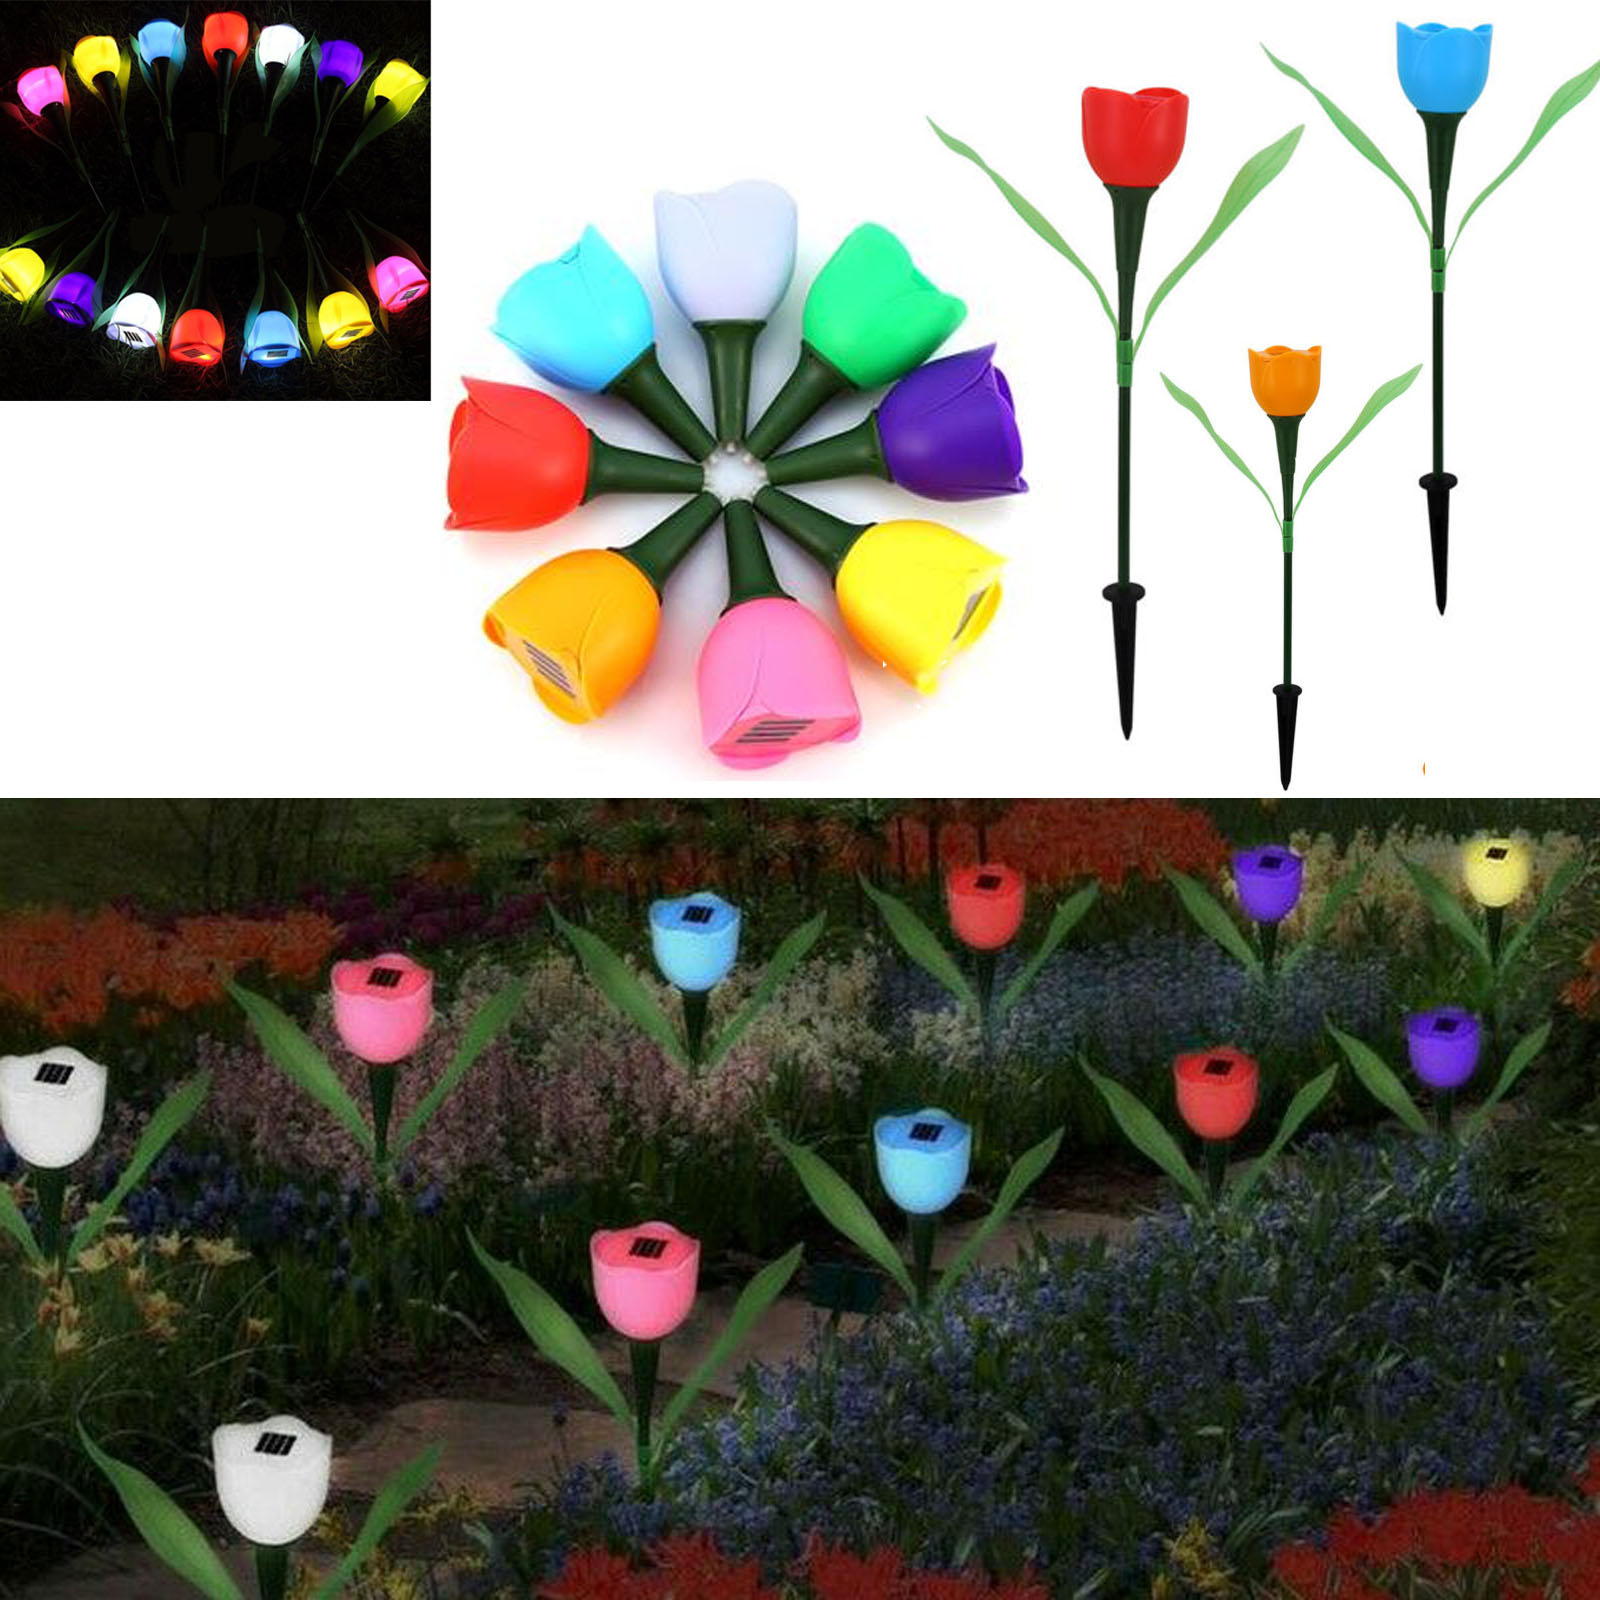 Outdoor Solar Powered Tulip Flower LED Light Yard Garden Lawn Landscape Lamp Hot